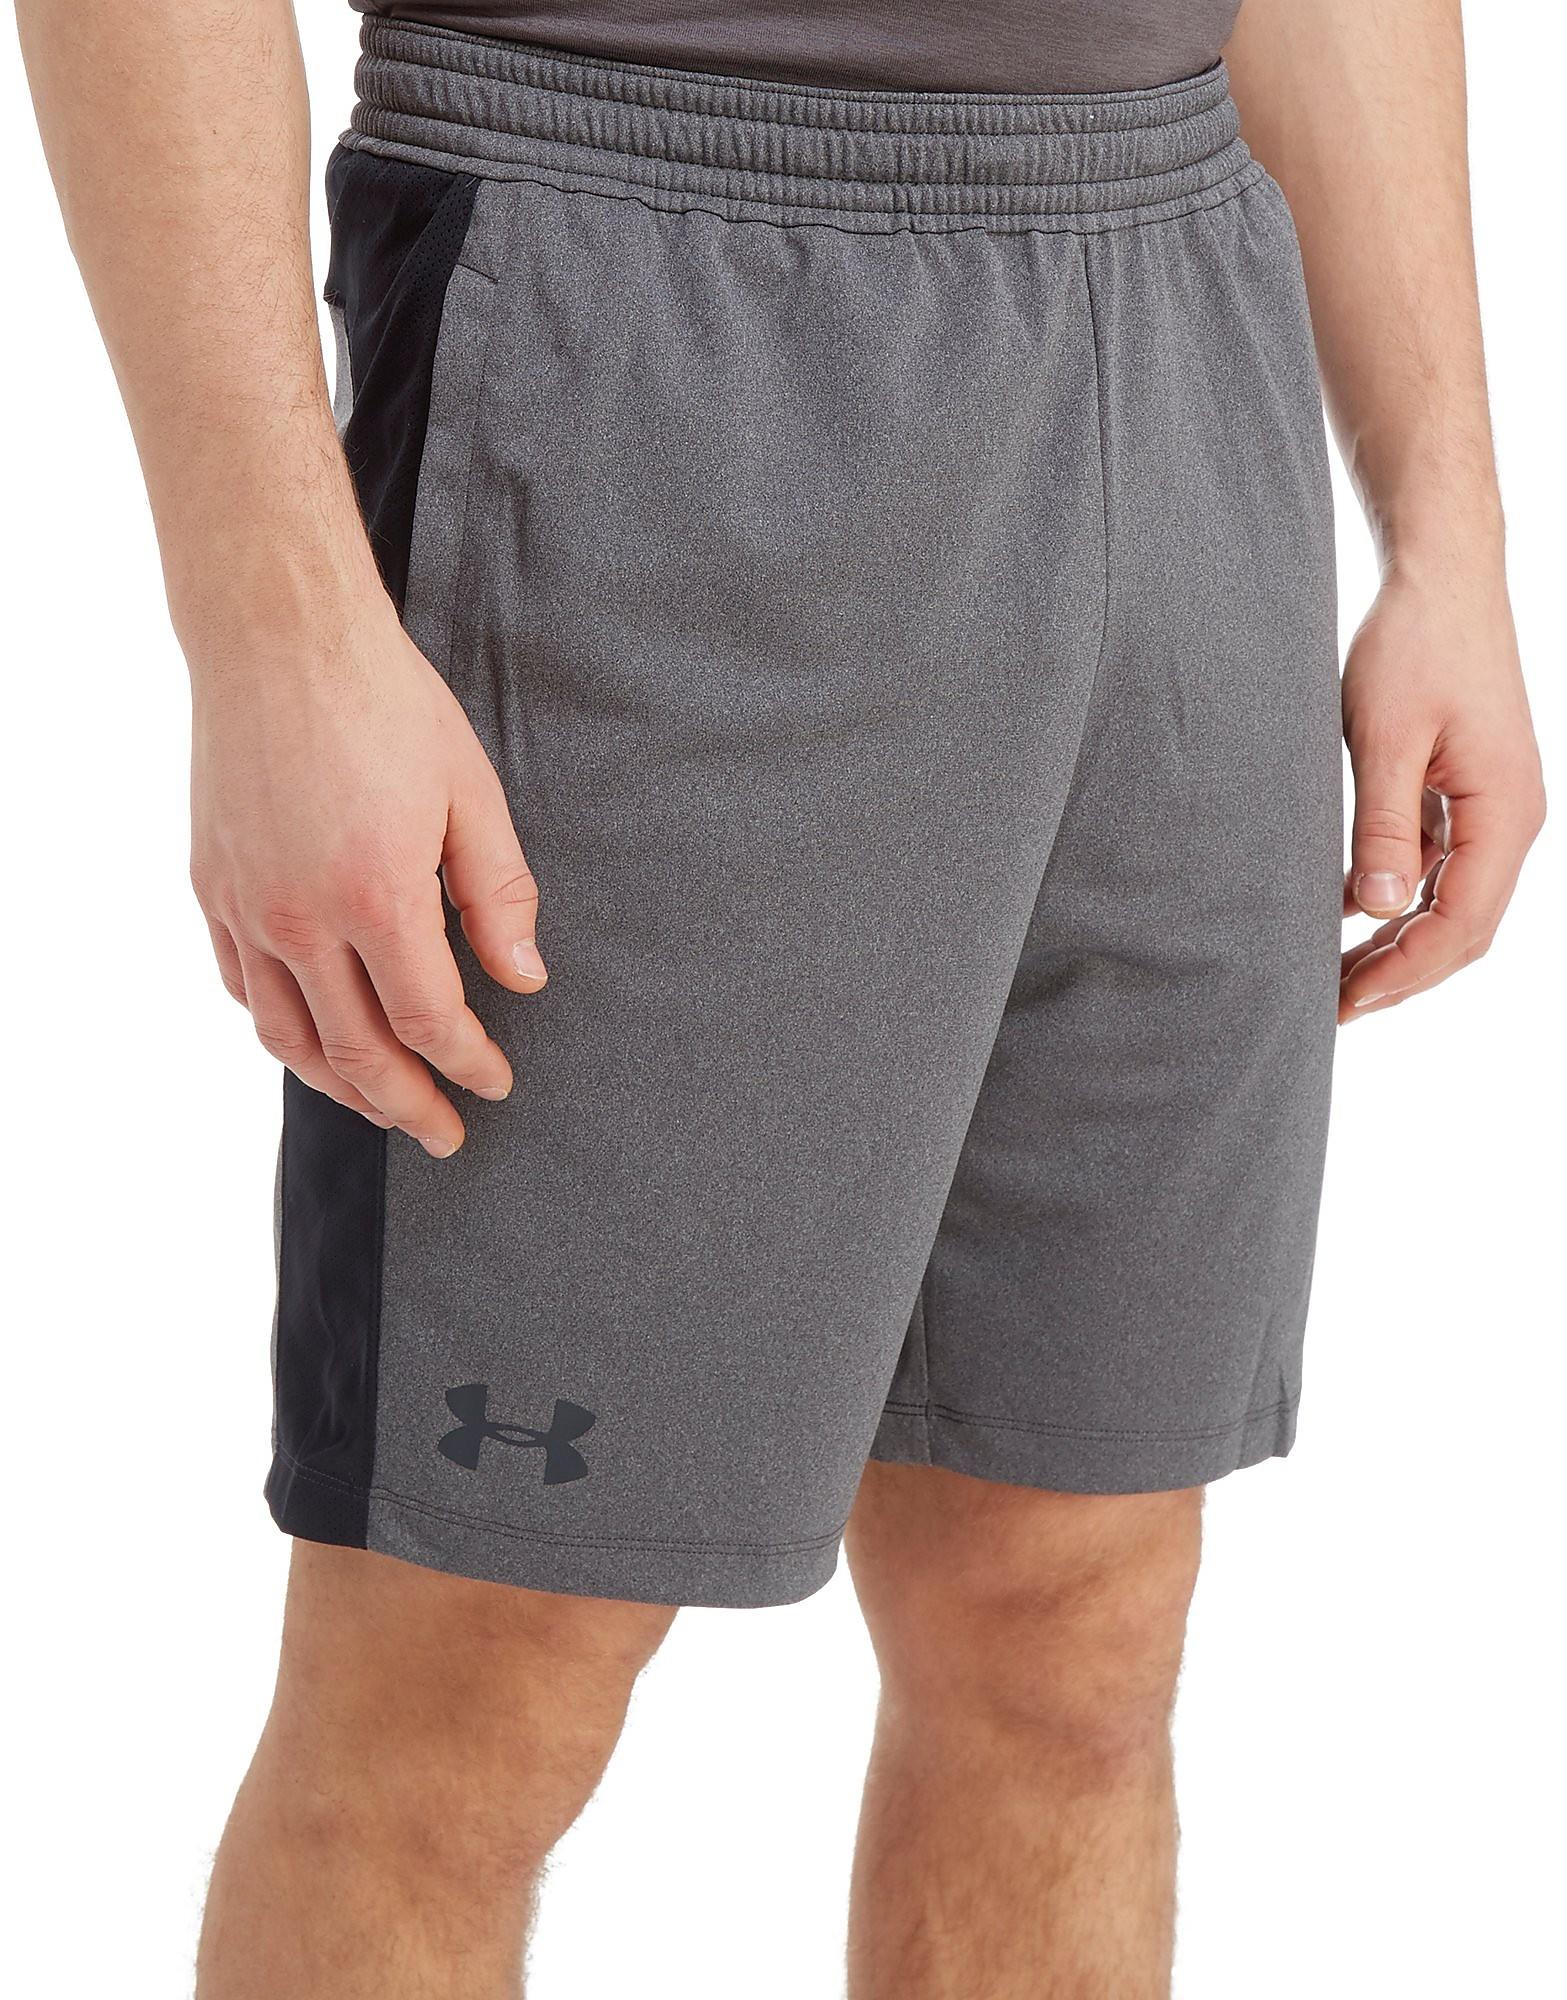 "Under Armour Raid 2.0 8"" Men's Shorts"